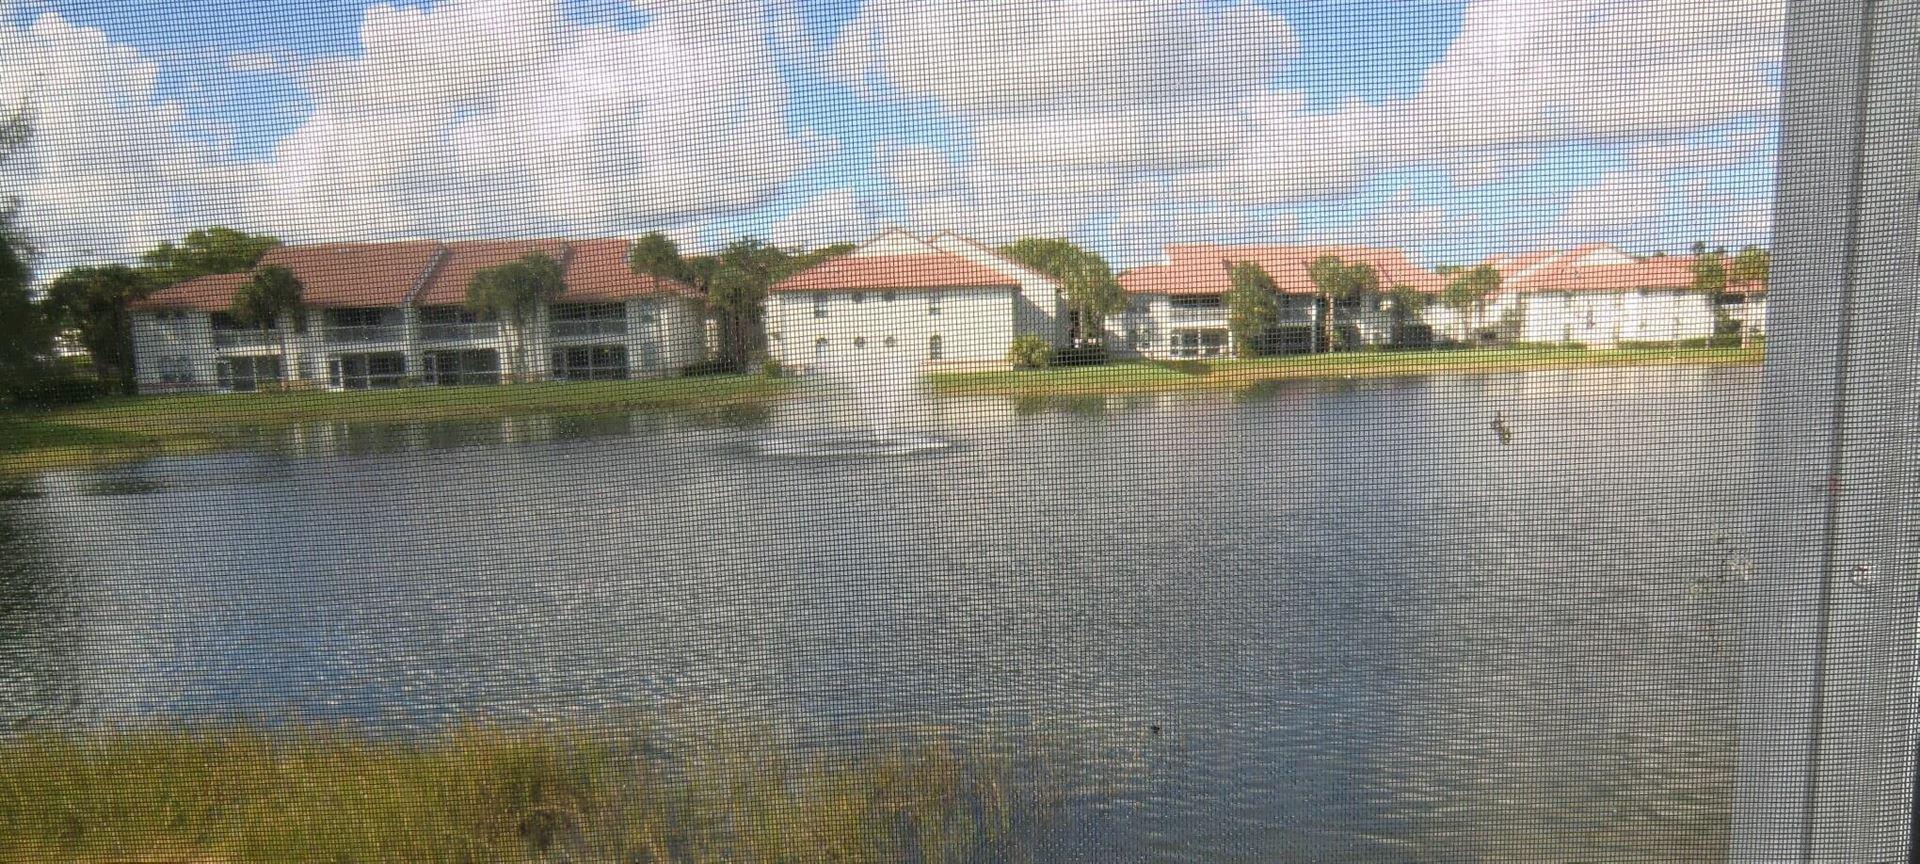 159 Cypress Point Drive, Palm Beach Gardens, FL 33418 - MLS#: RX-10752135